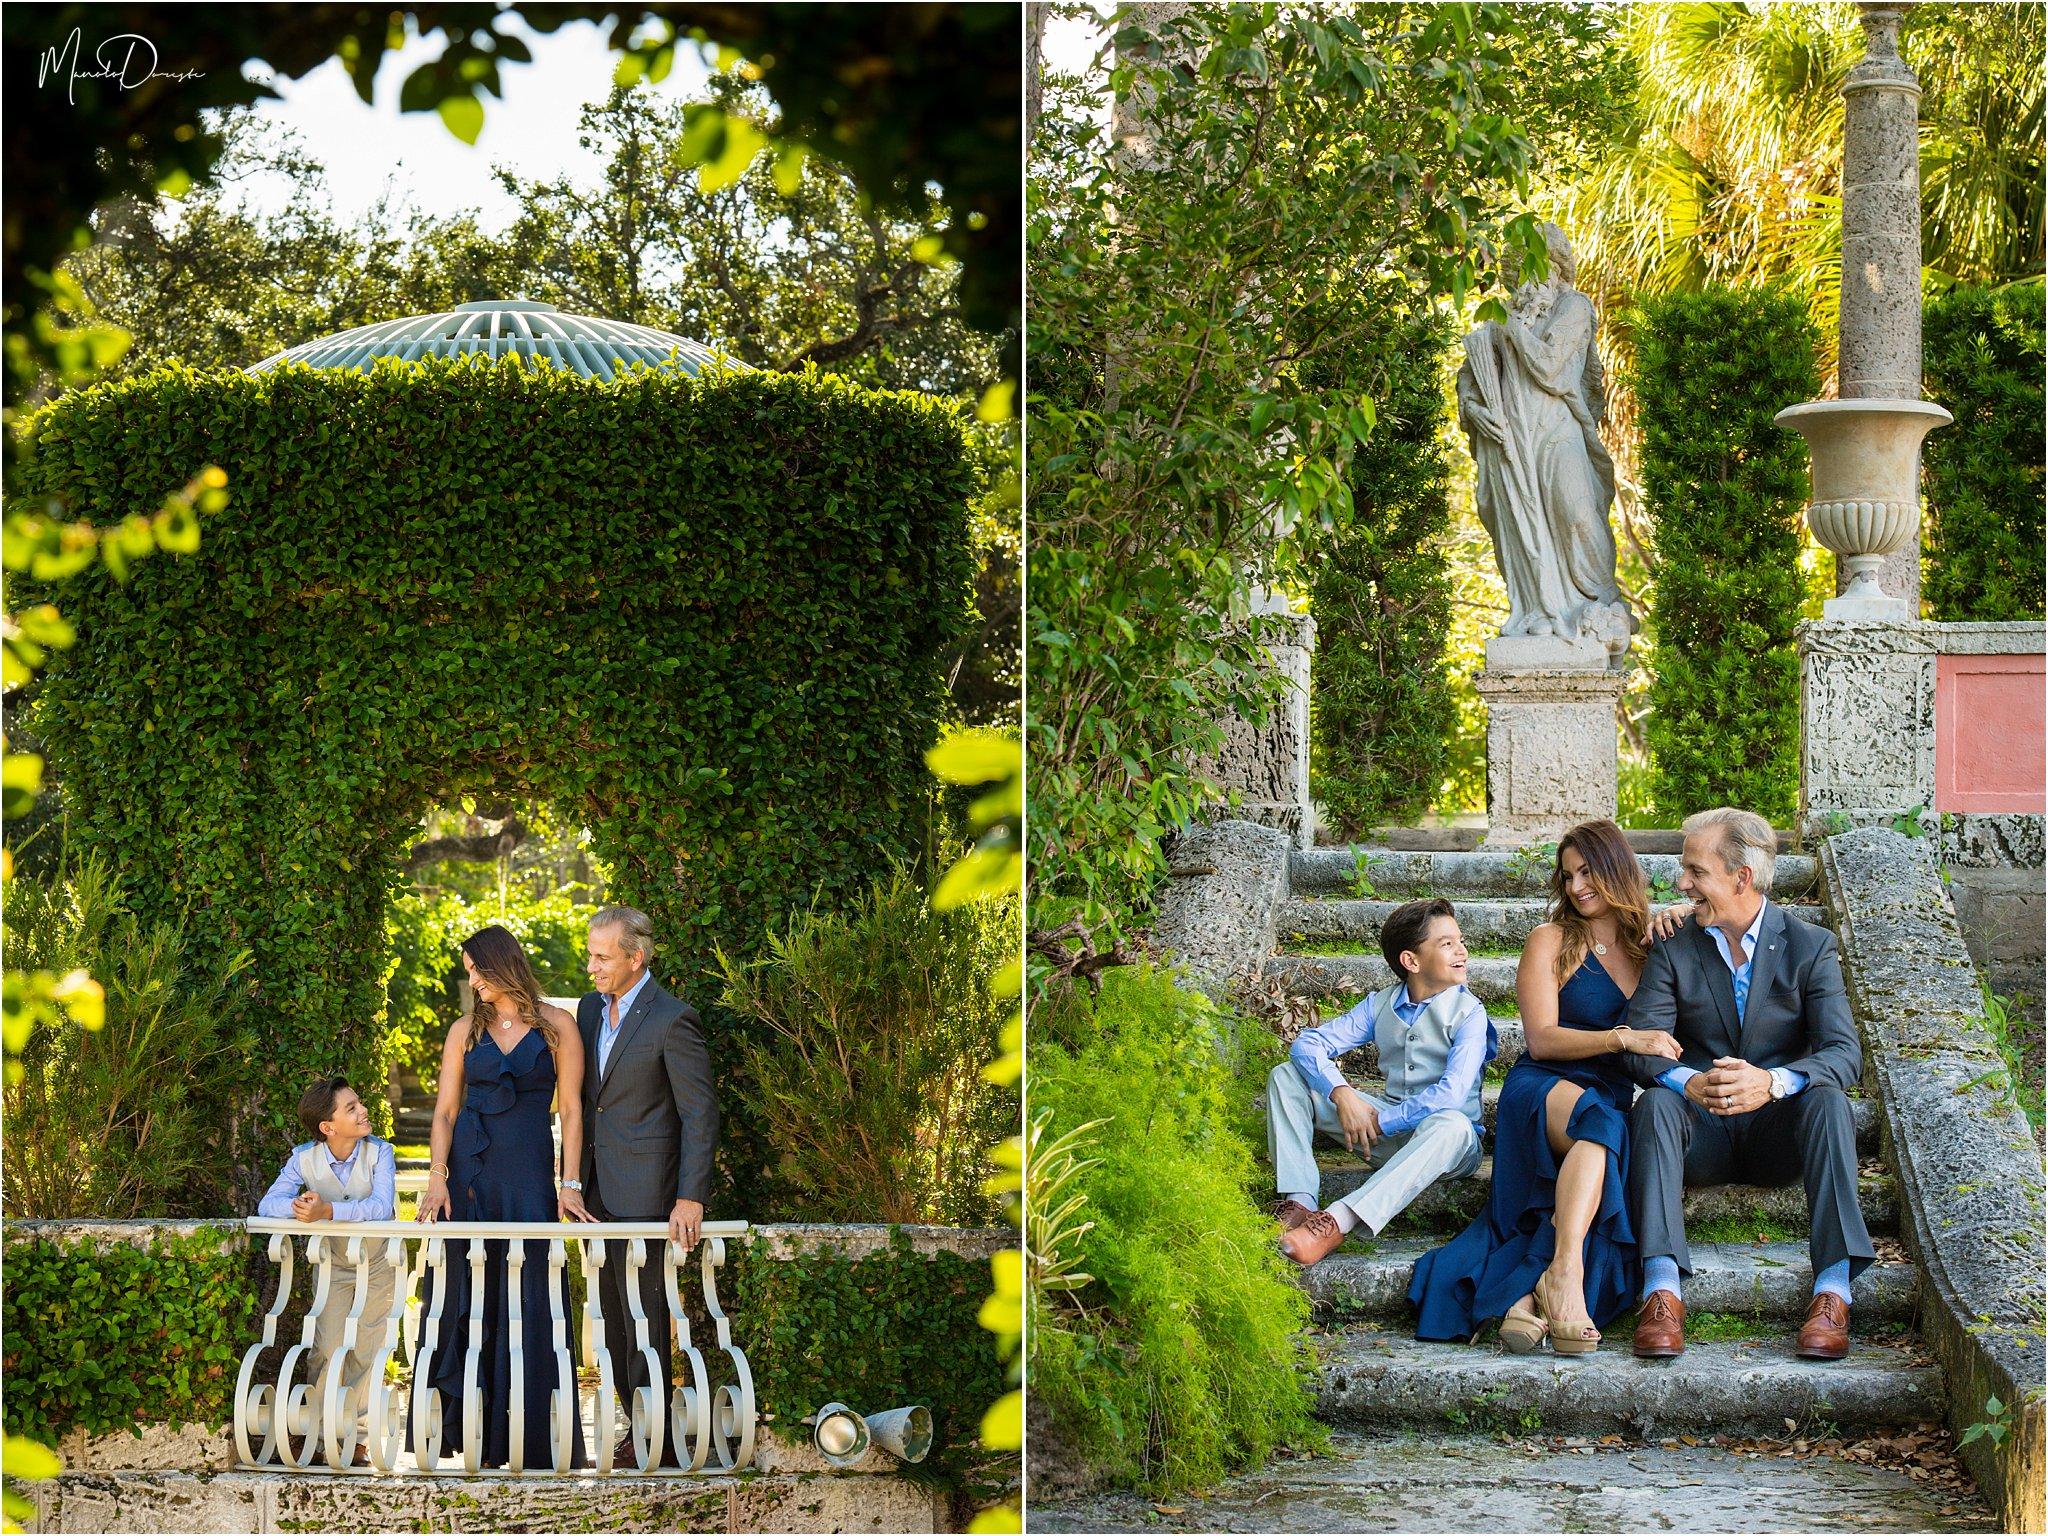 0071_ManoloDoreste_InFocusStudios_Wedding_Family_Photography_Miami_MiamiPhotographer.jpg